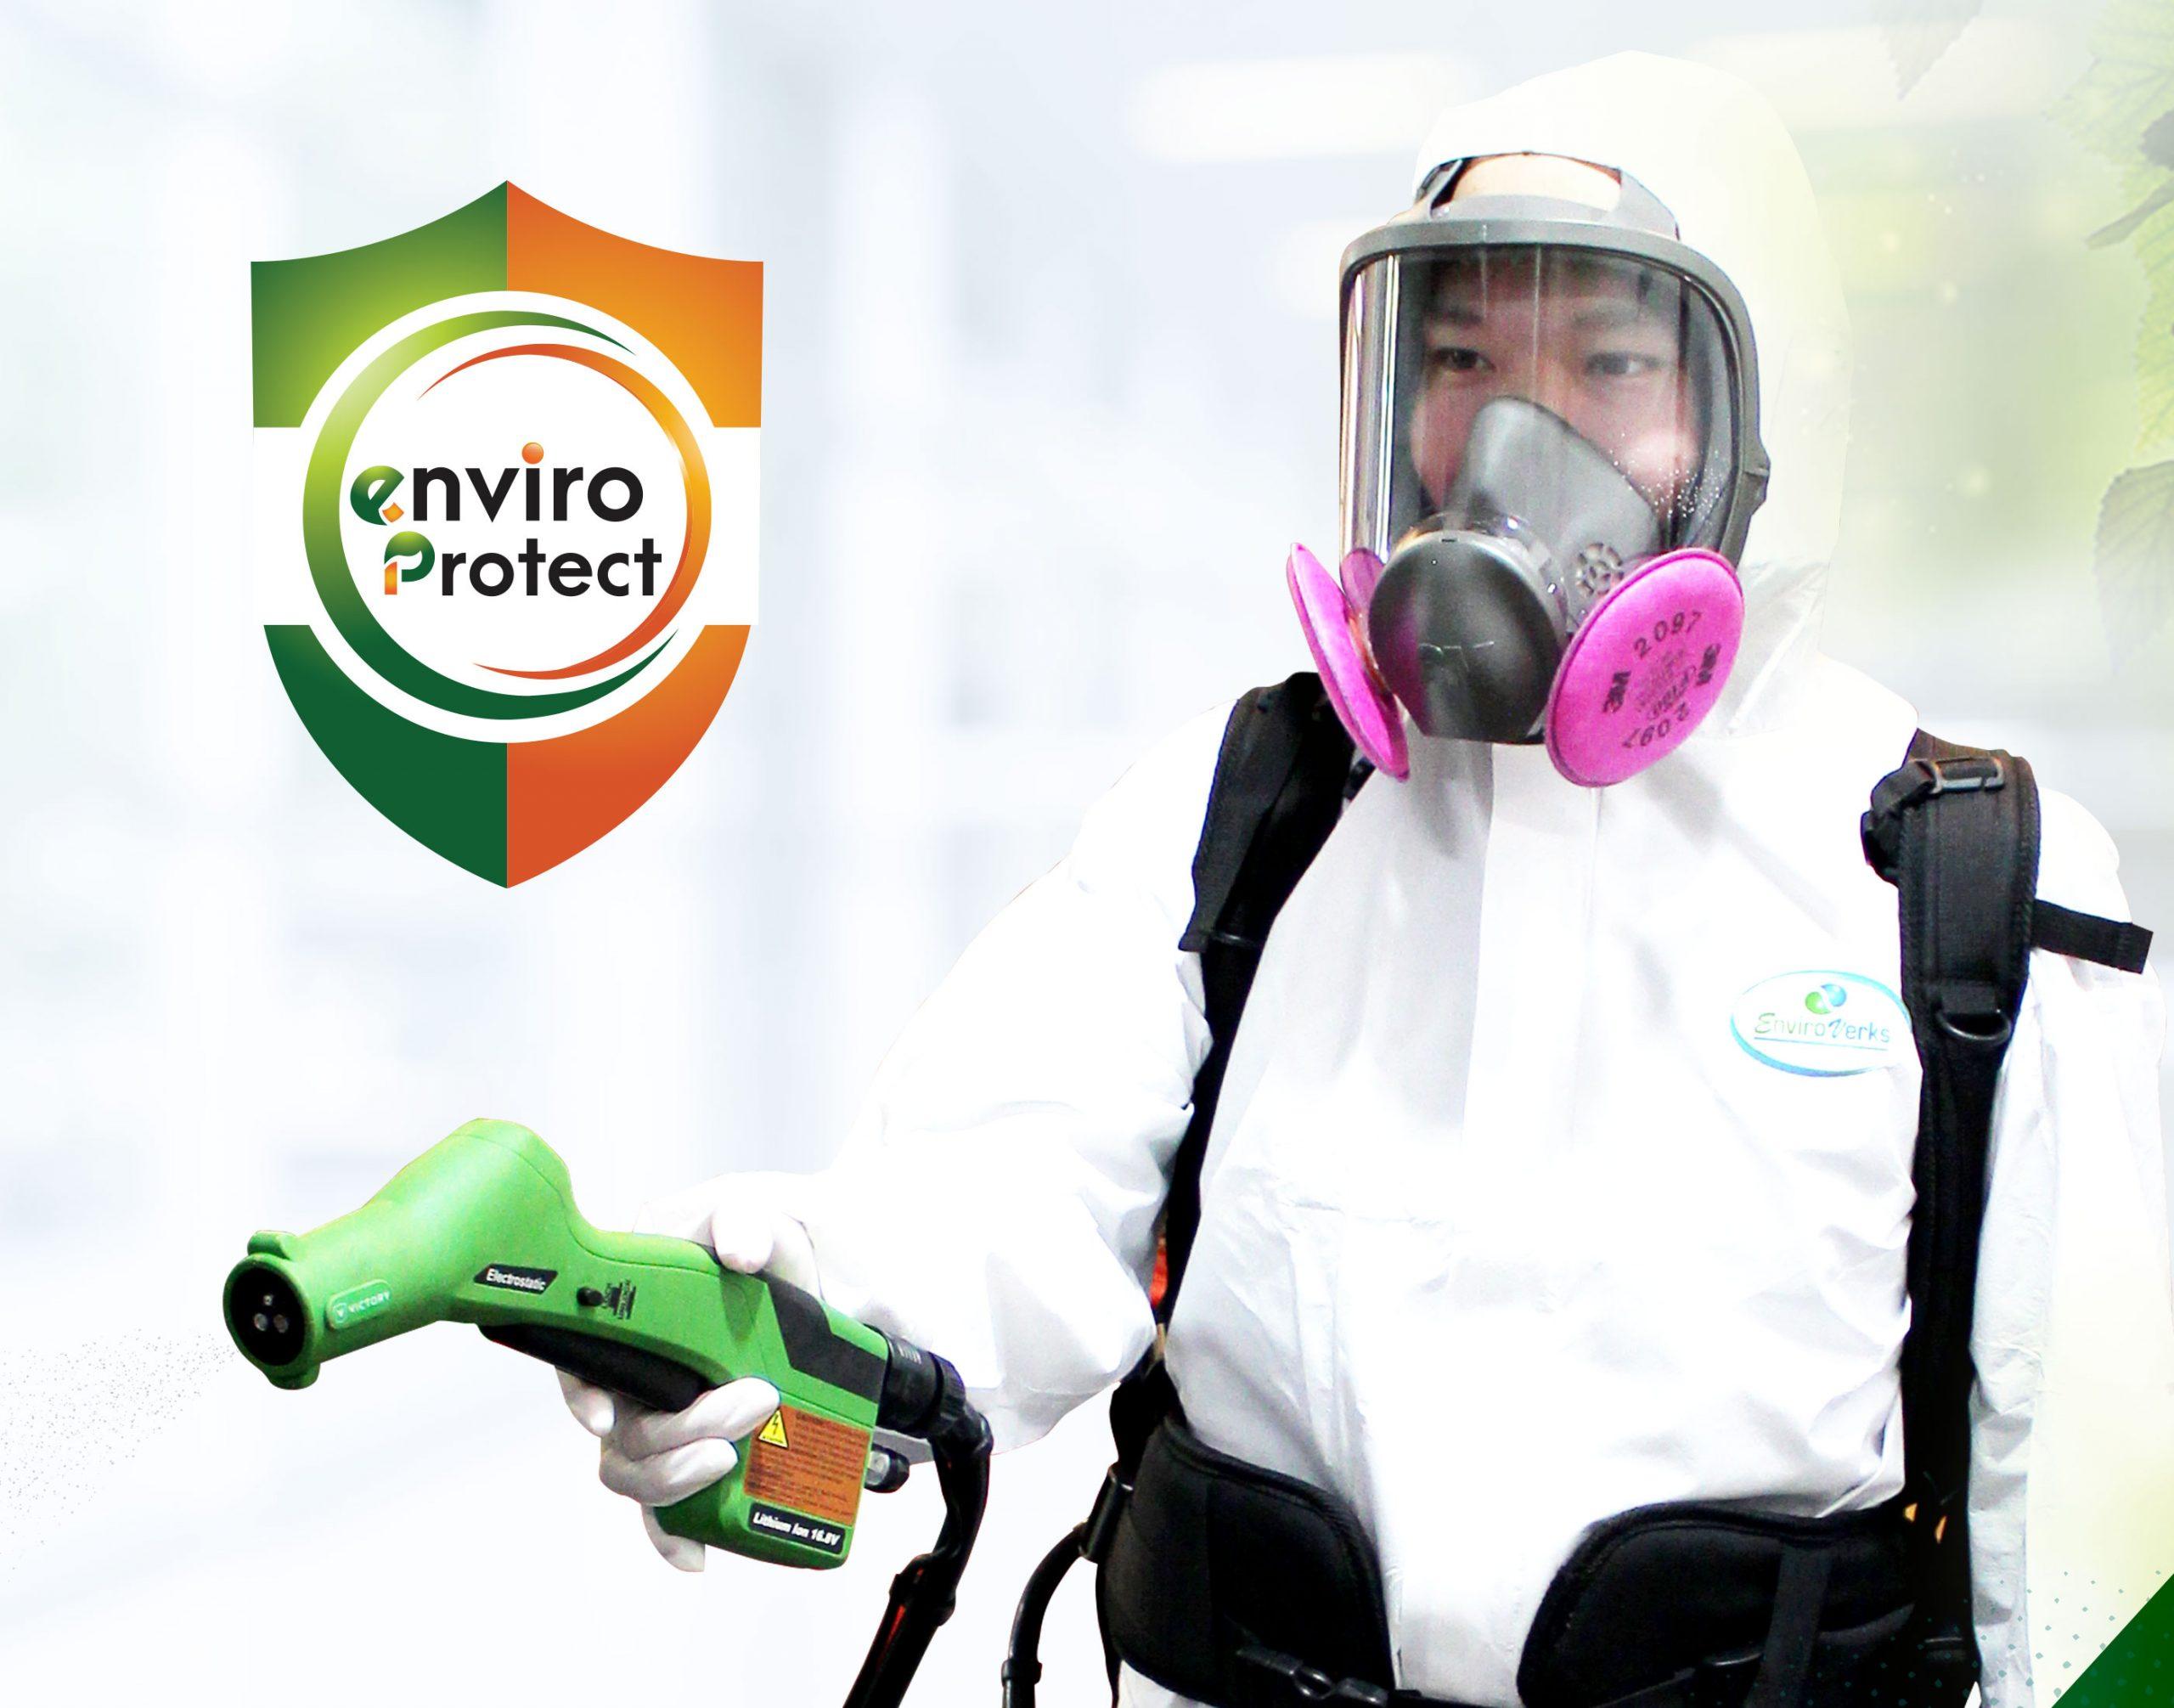 enviro protect surface protector